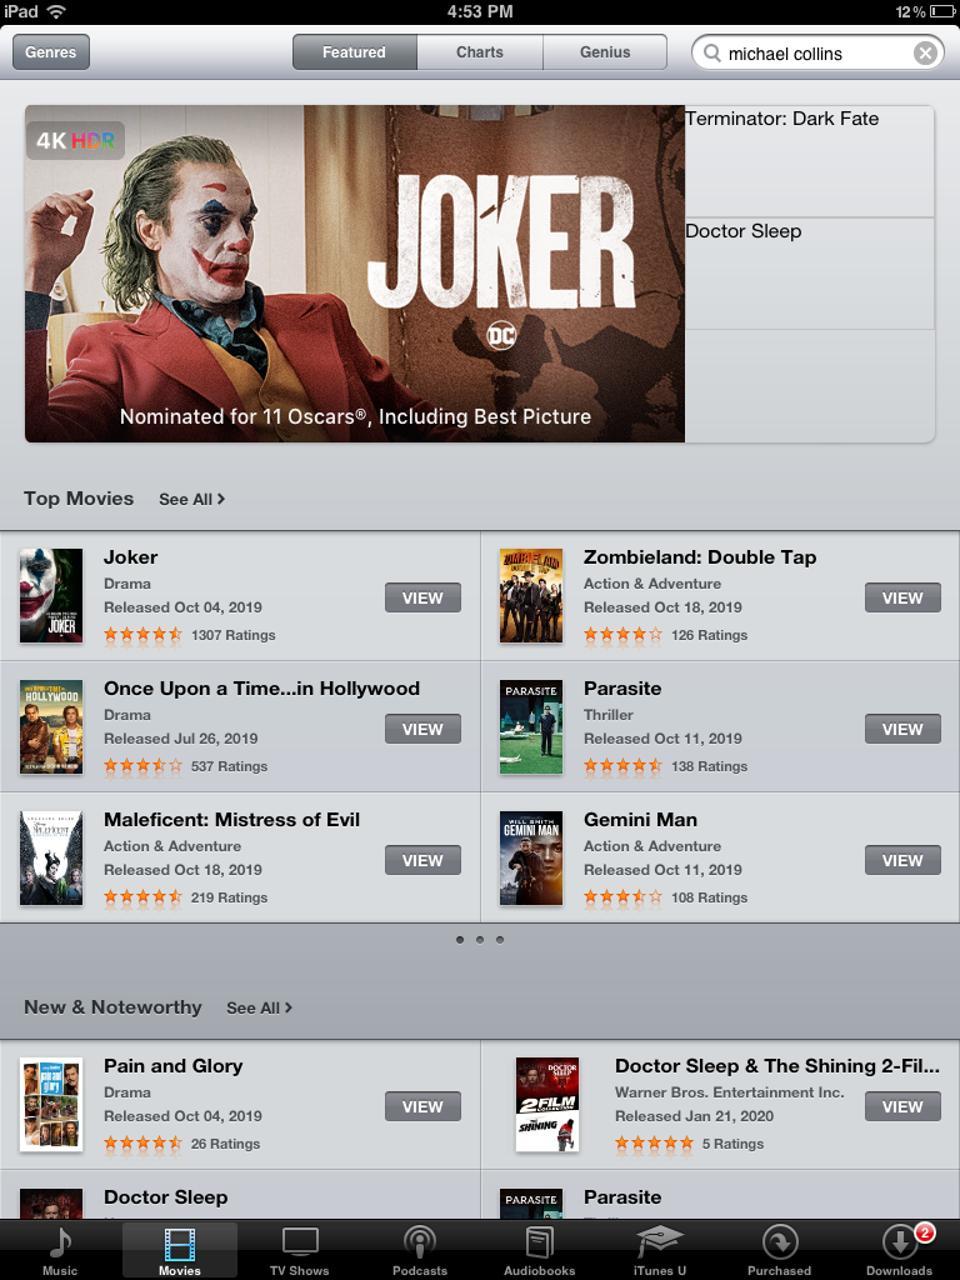 The iTunes Store on iPad 1